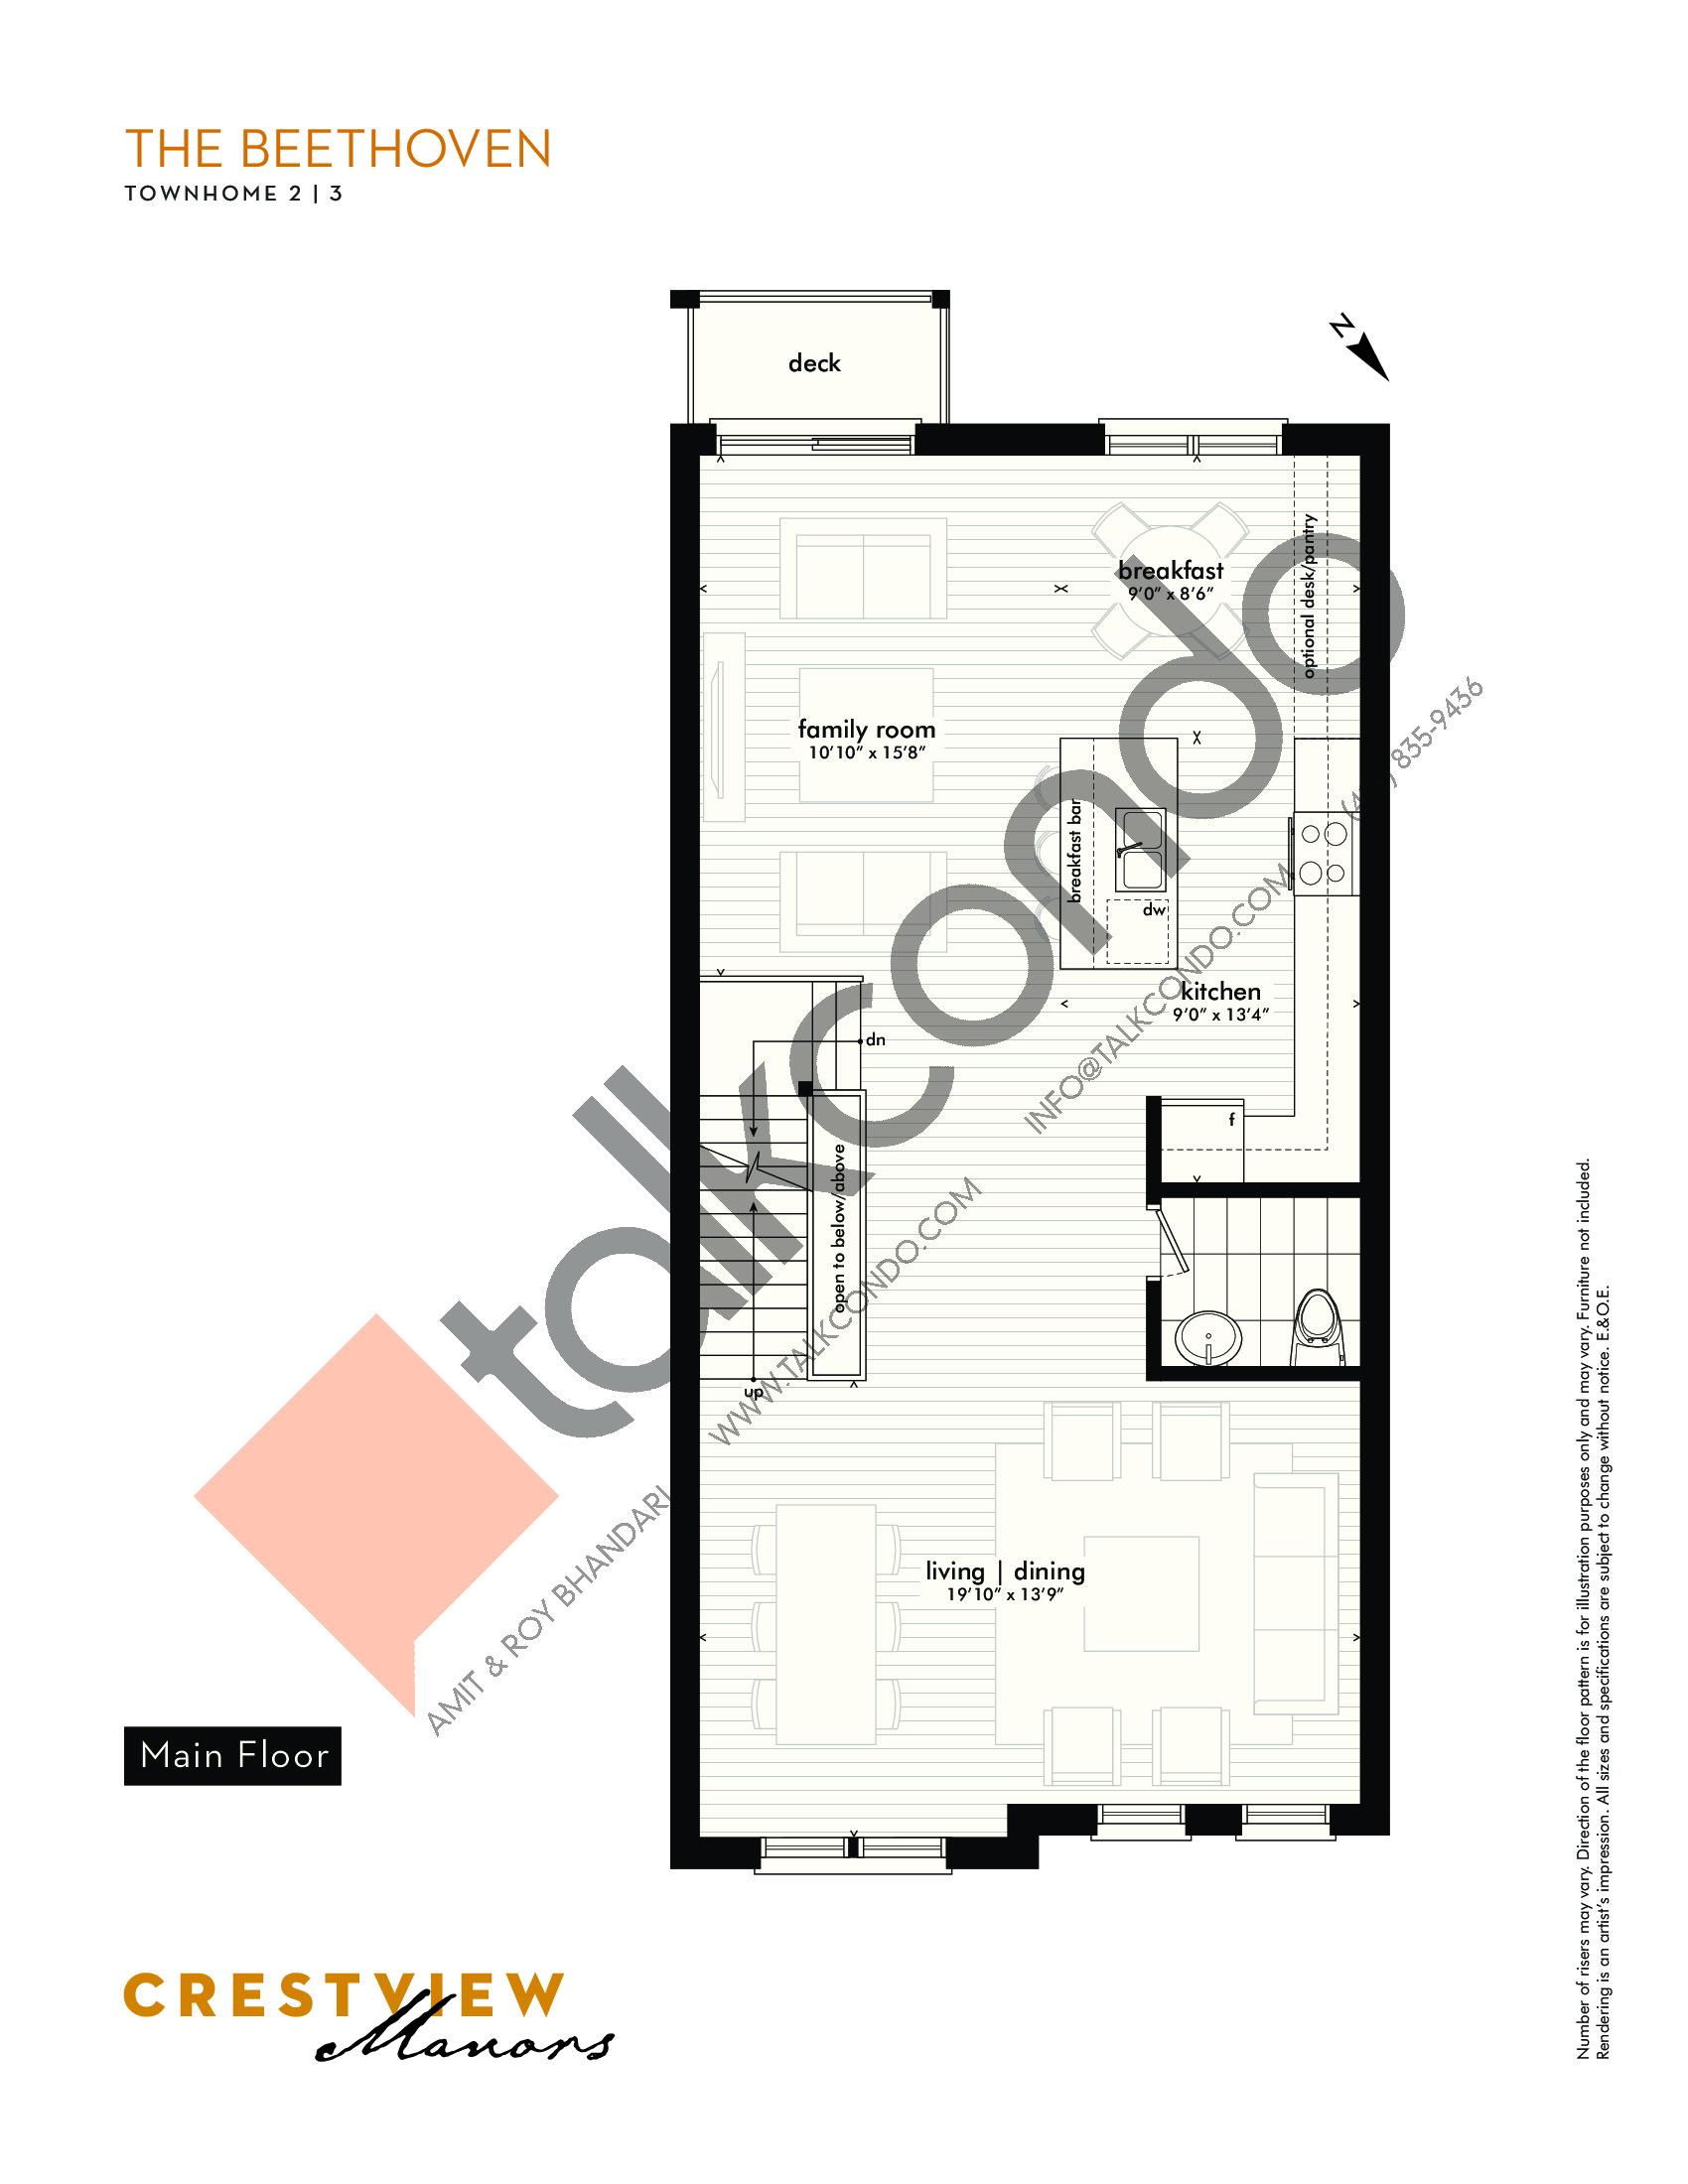 The Beethoven - Main Floor Floor Plan at Crestview Manors - 2362 sq.ft